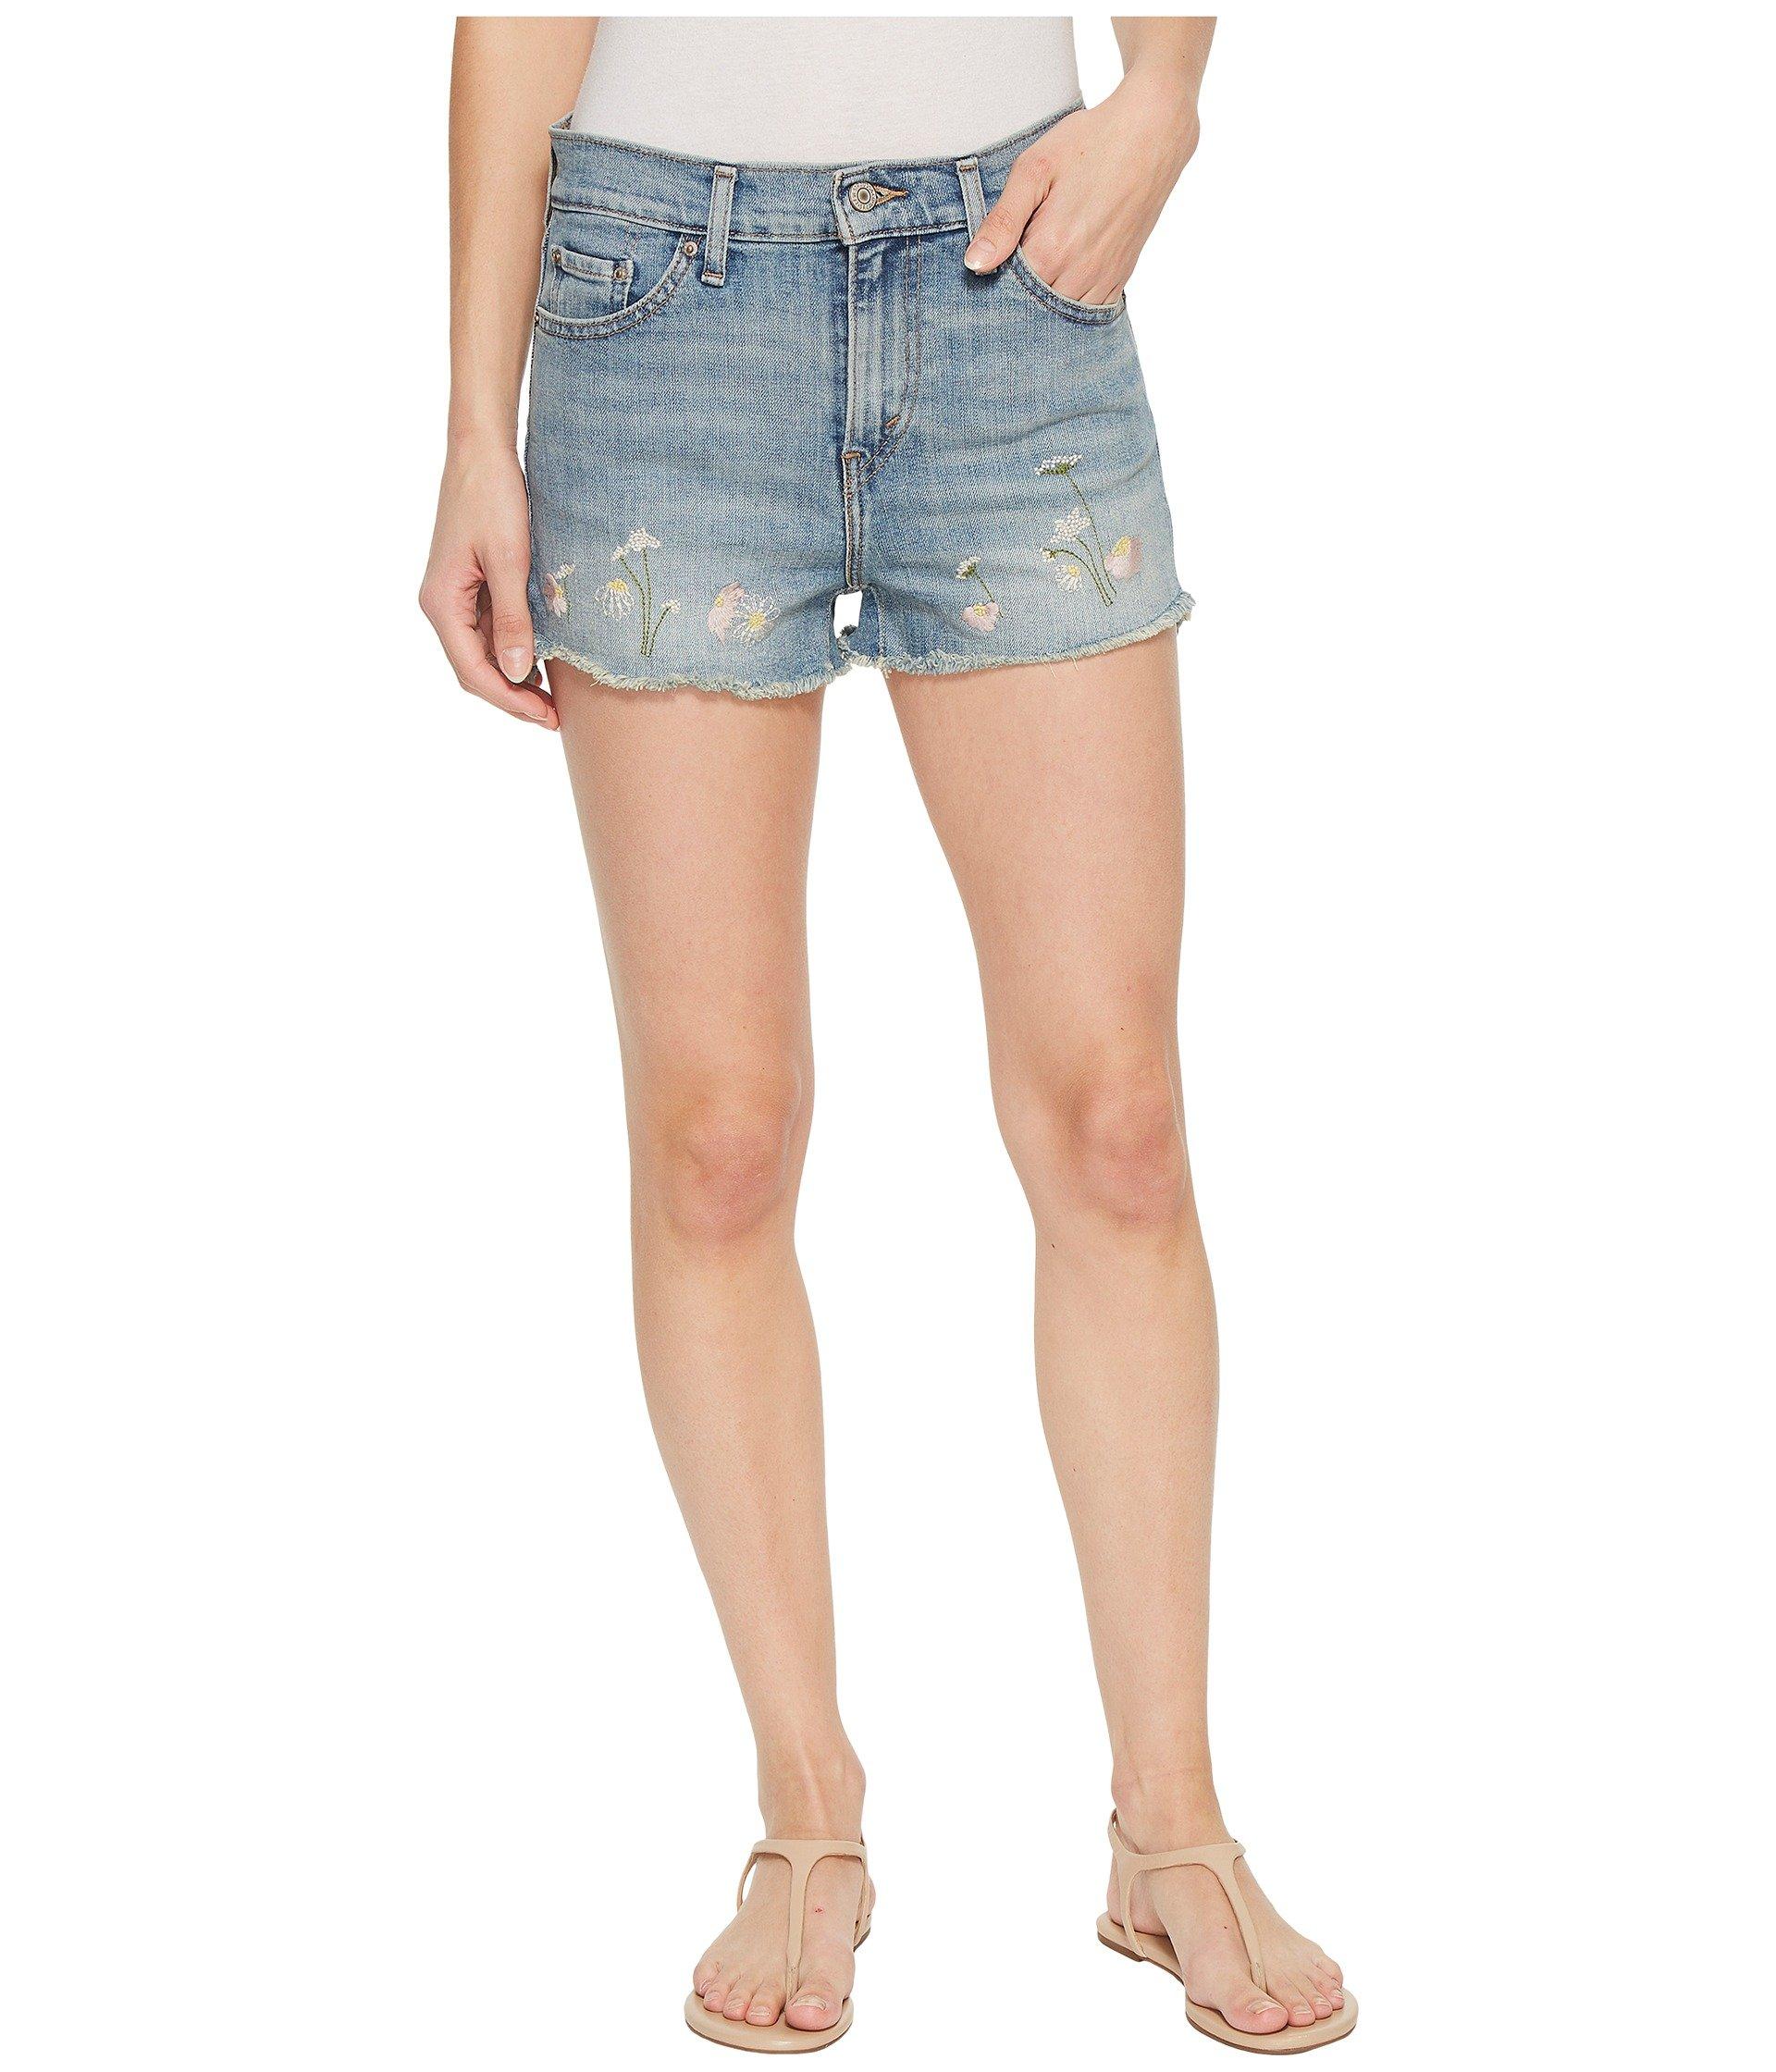 Levi's Women's High Rise Shorts, Blue Wildflower, 25 (US 0)